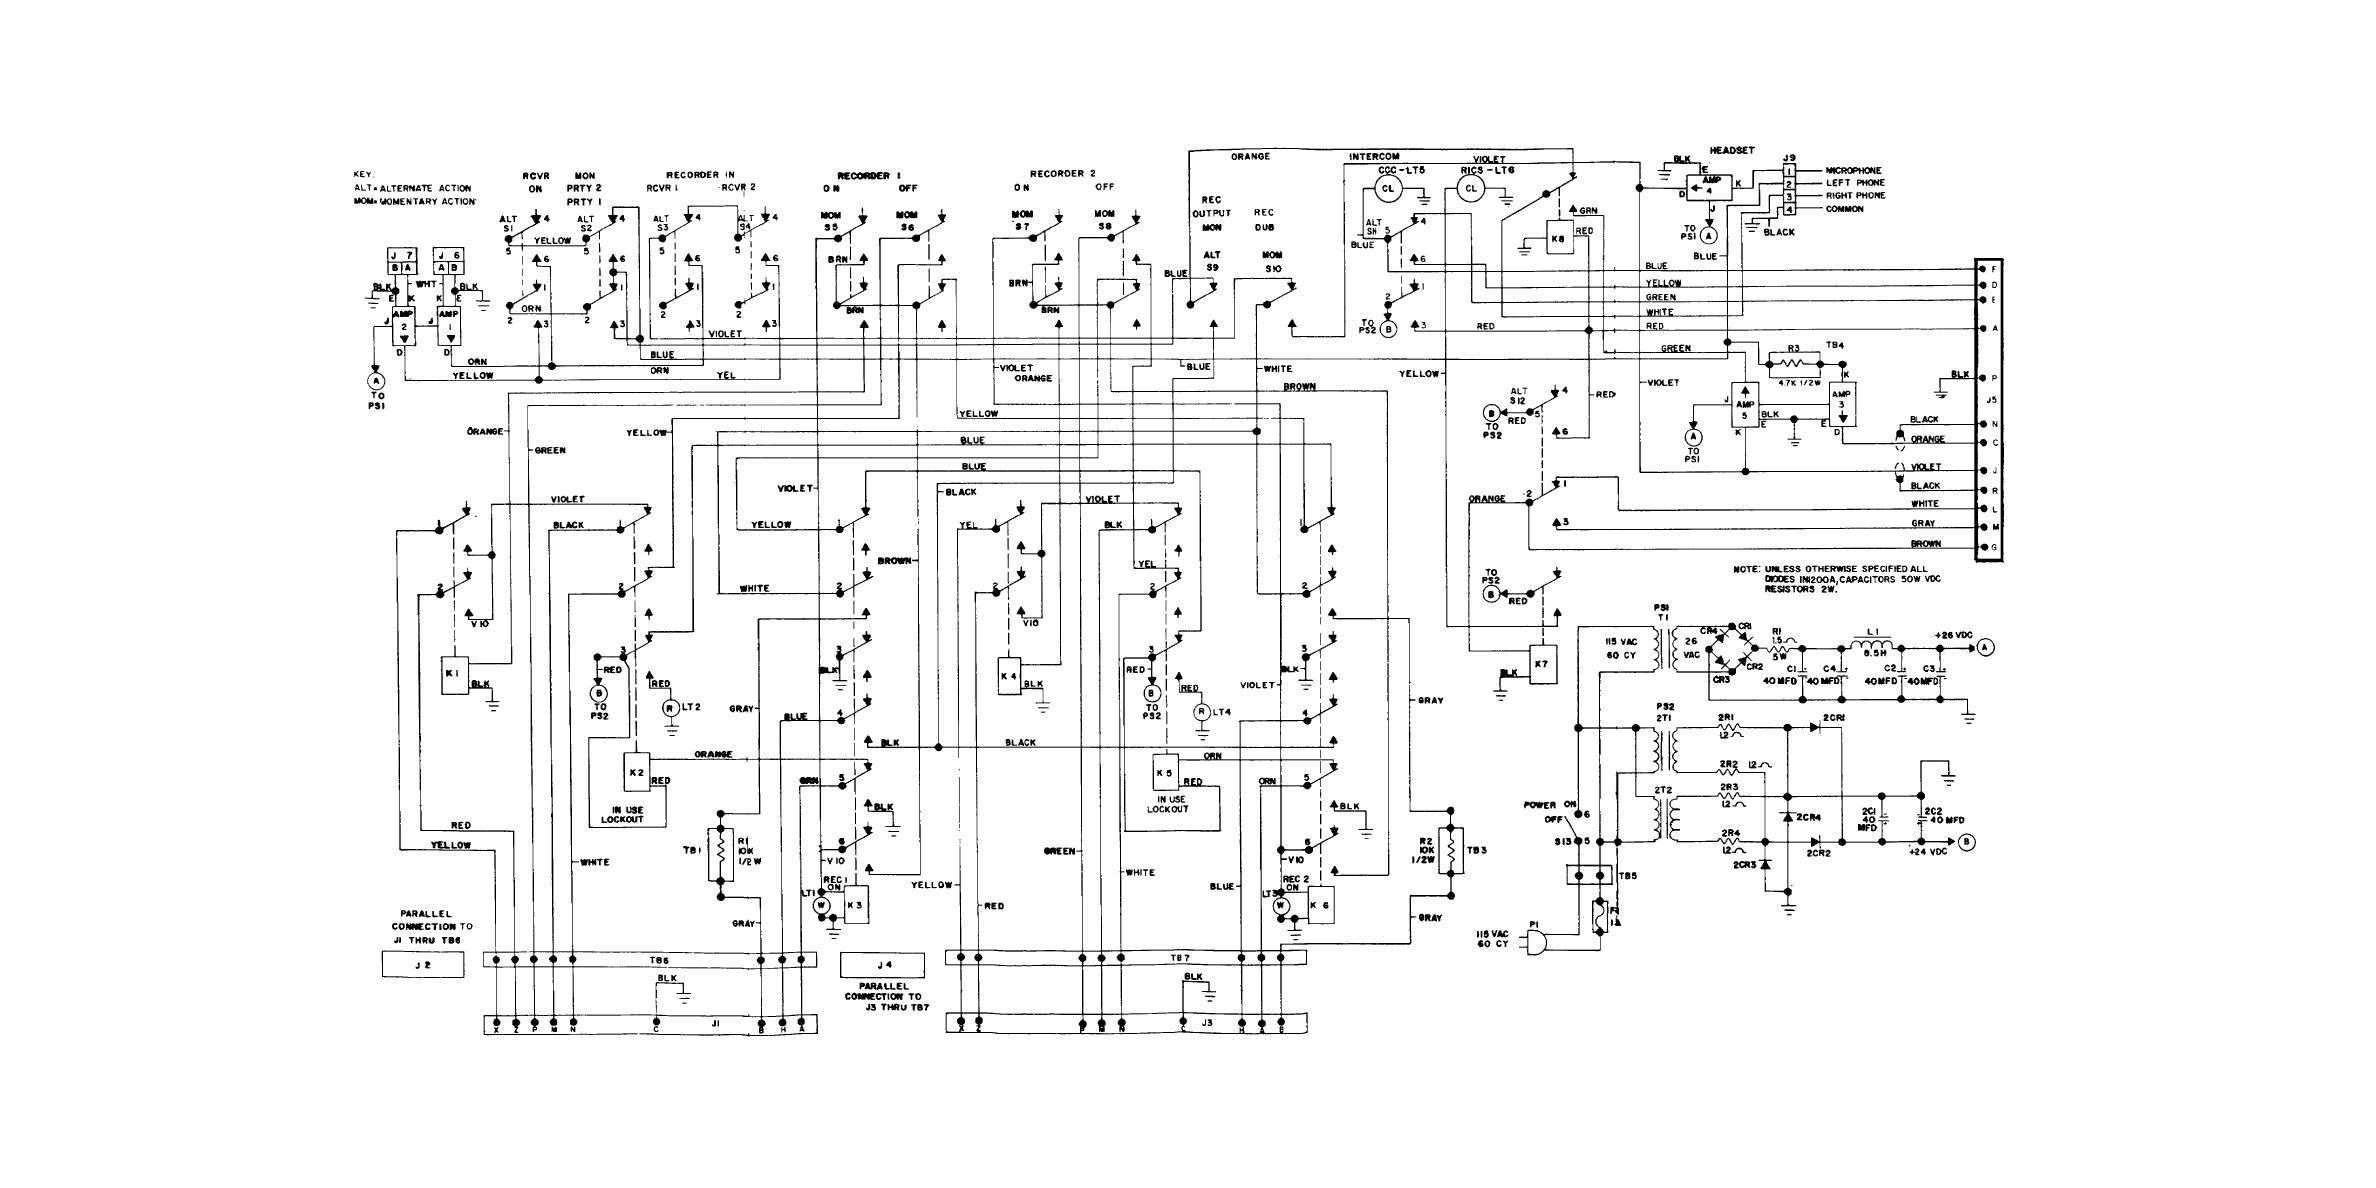 Kib Monitor Wiring Diagram Great Design Of Panel Tank M21vw Micro System